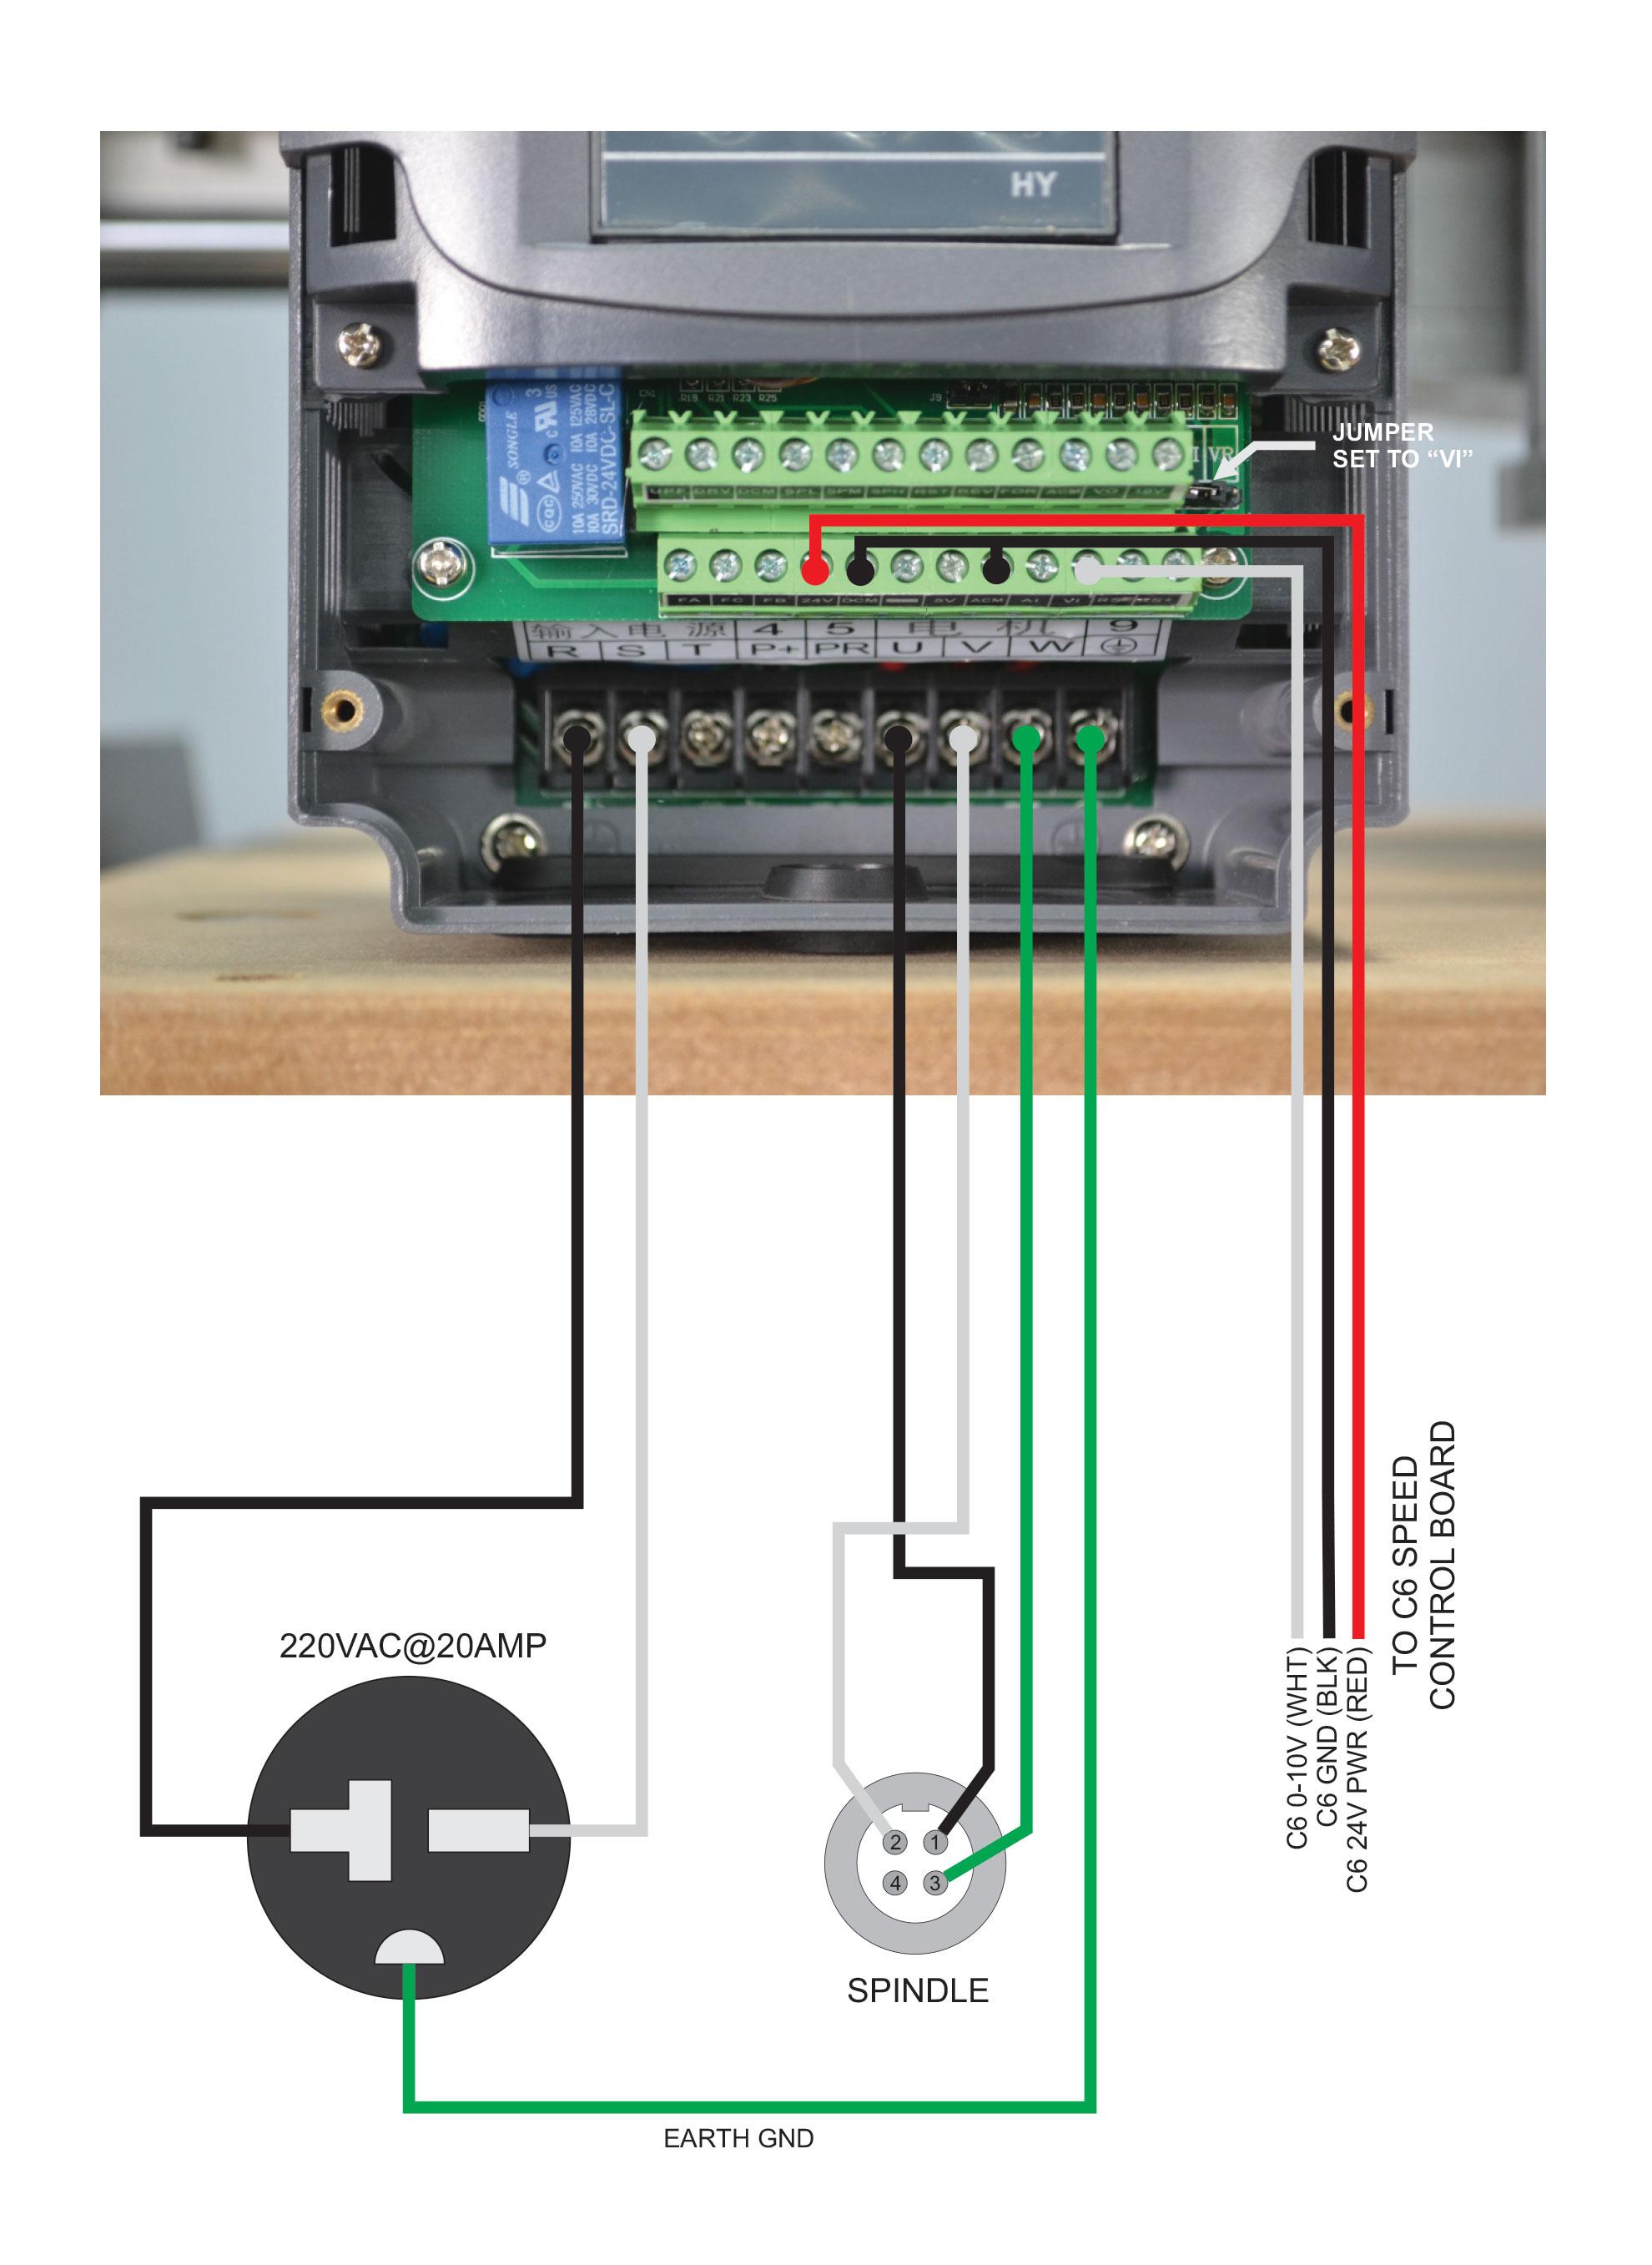 Vfd Wiring Diagram : wiring, diagram, File:VFD, Wiring, Diagram.jpg, PROBOTIX